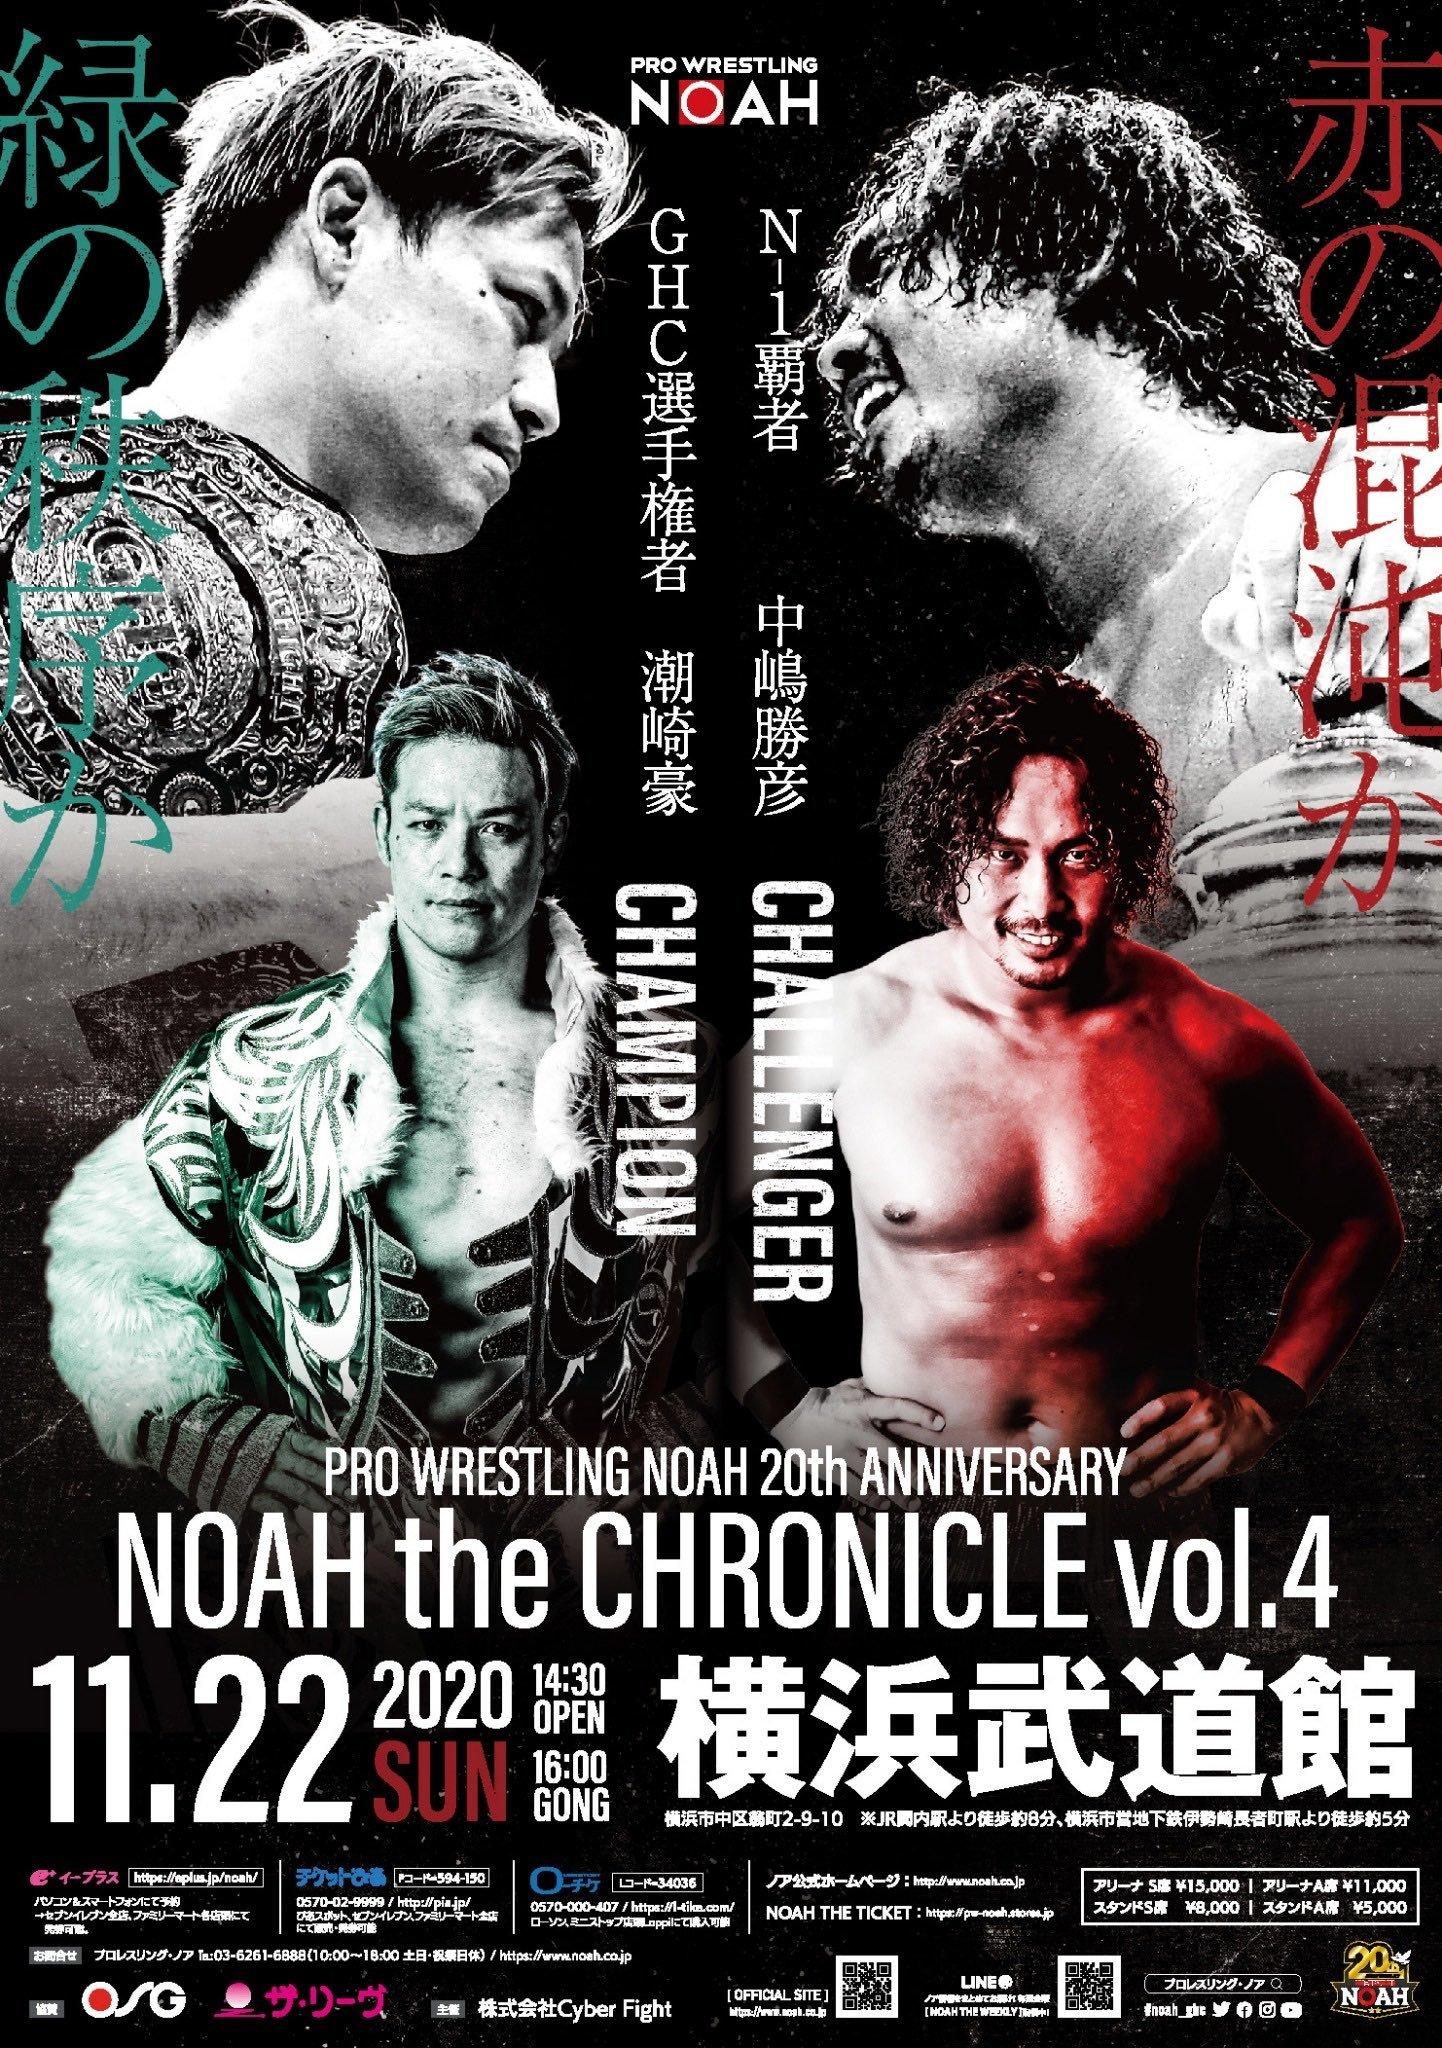 『20th ANNIVERSARY NOAH the CHRONICLE vol.4 横浜大会』は11月22日(日)に横浜武道館で開催